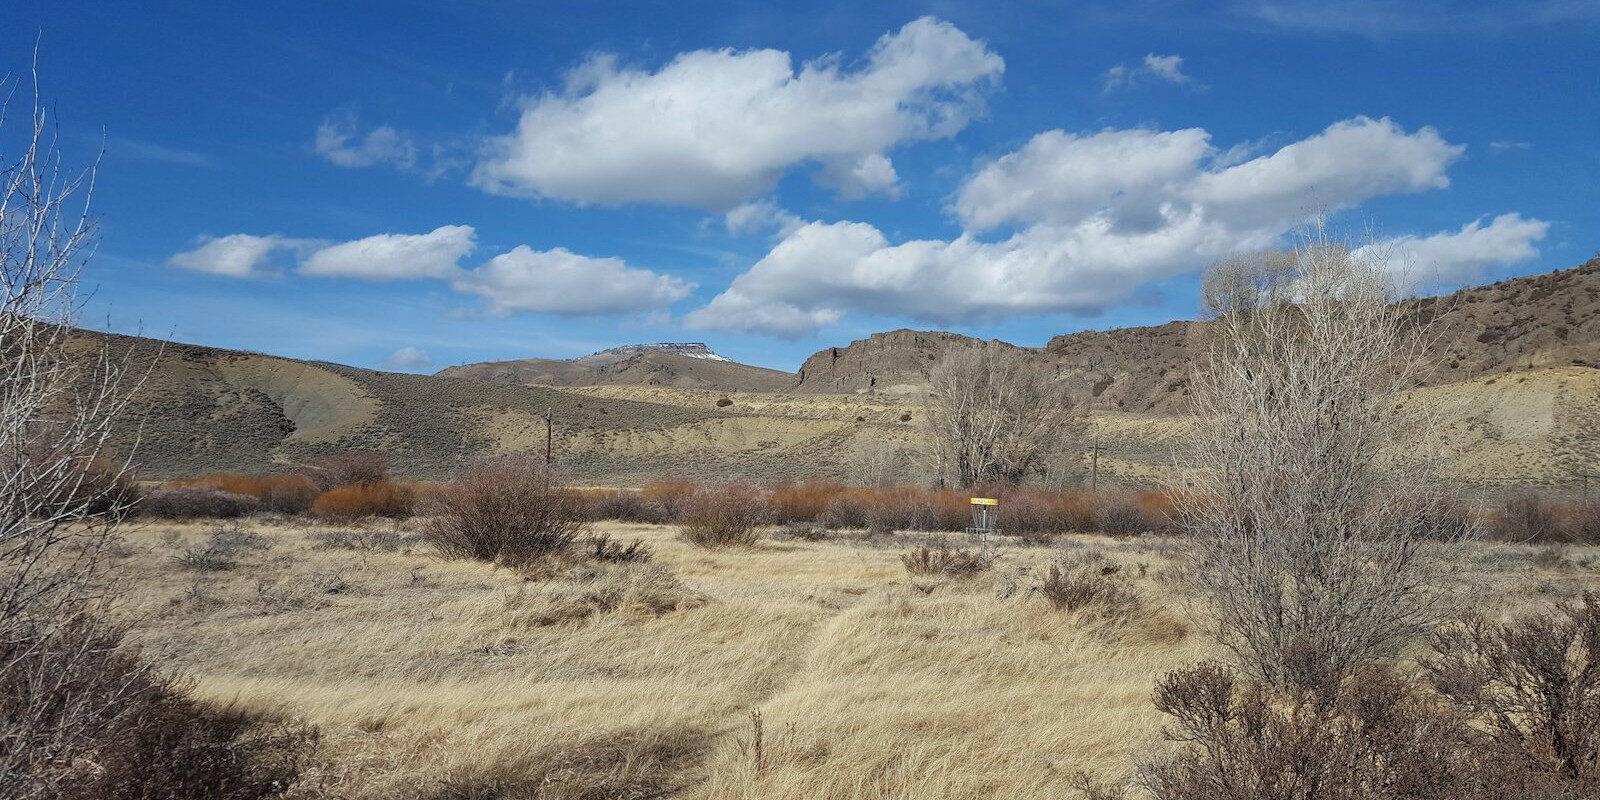 Image of the Pioneer Park disc golf area in Hot Sulphur Springs, Colorado